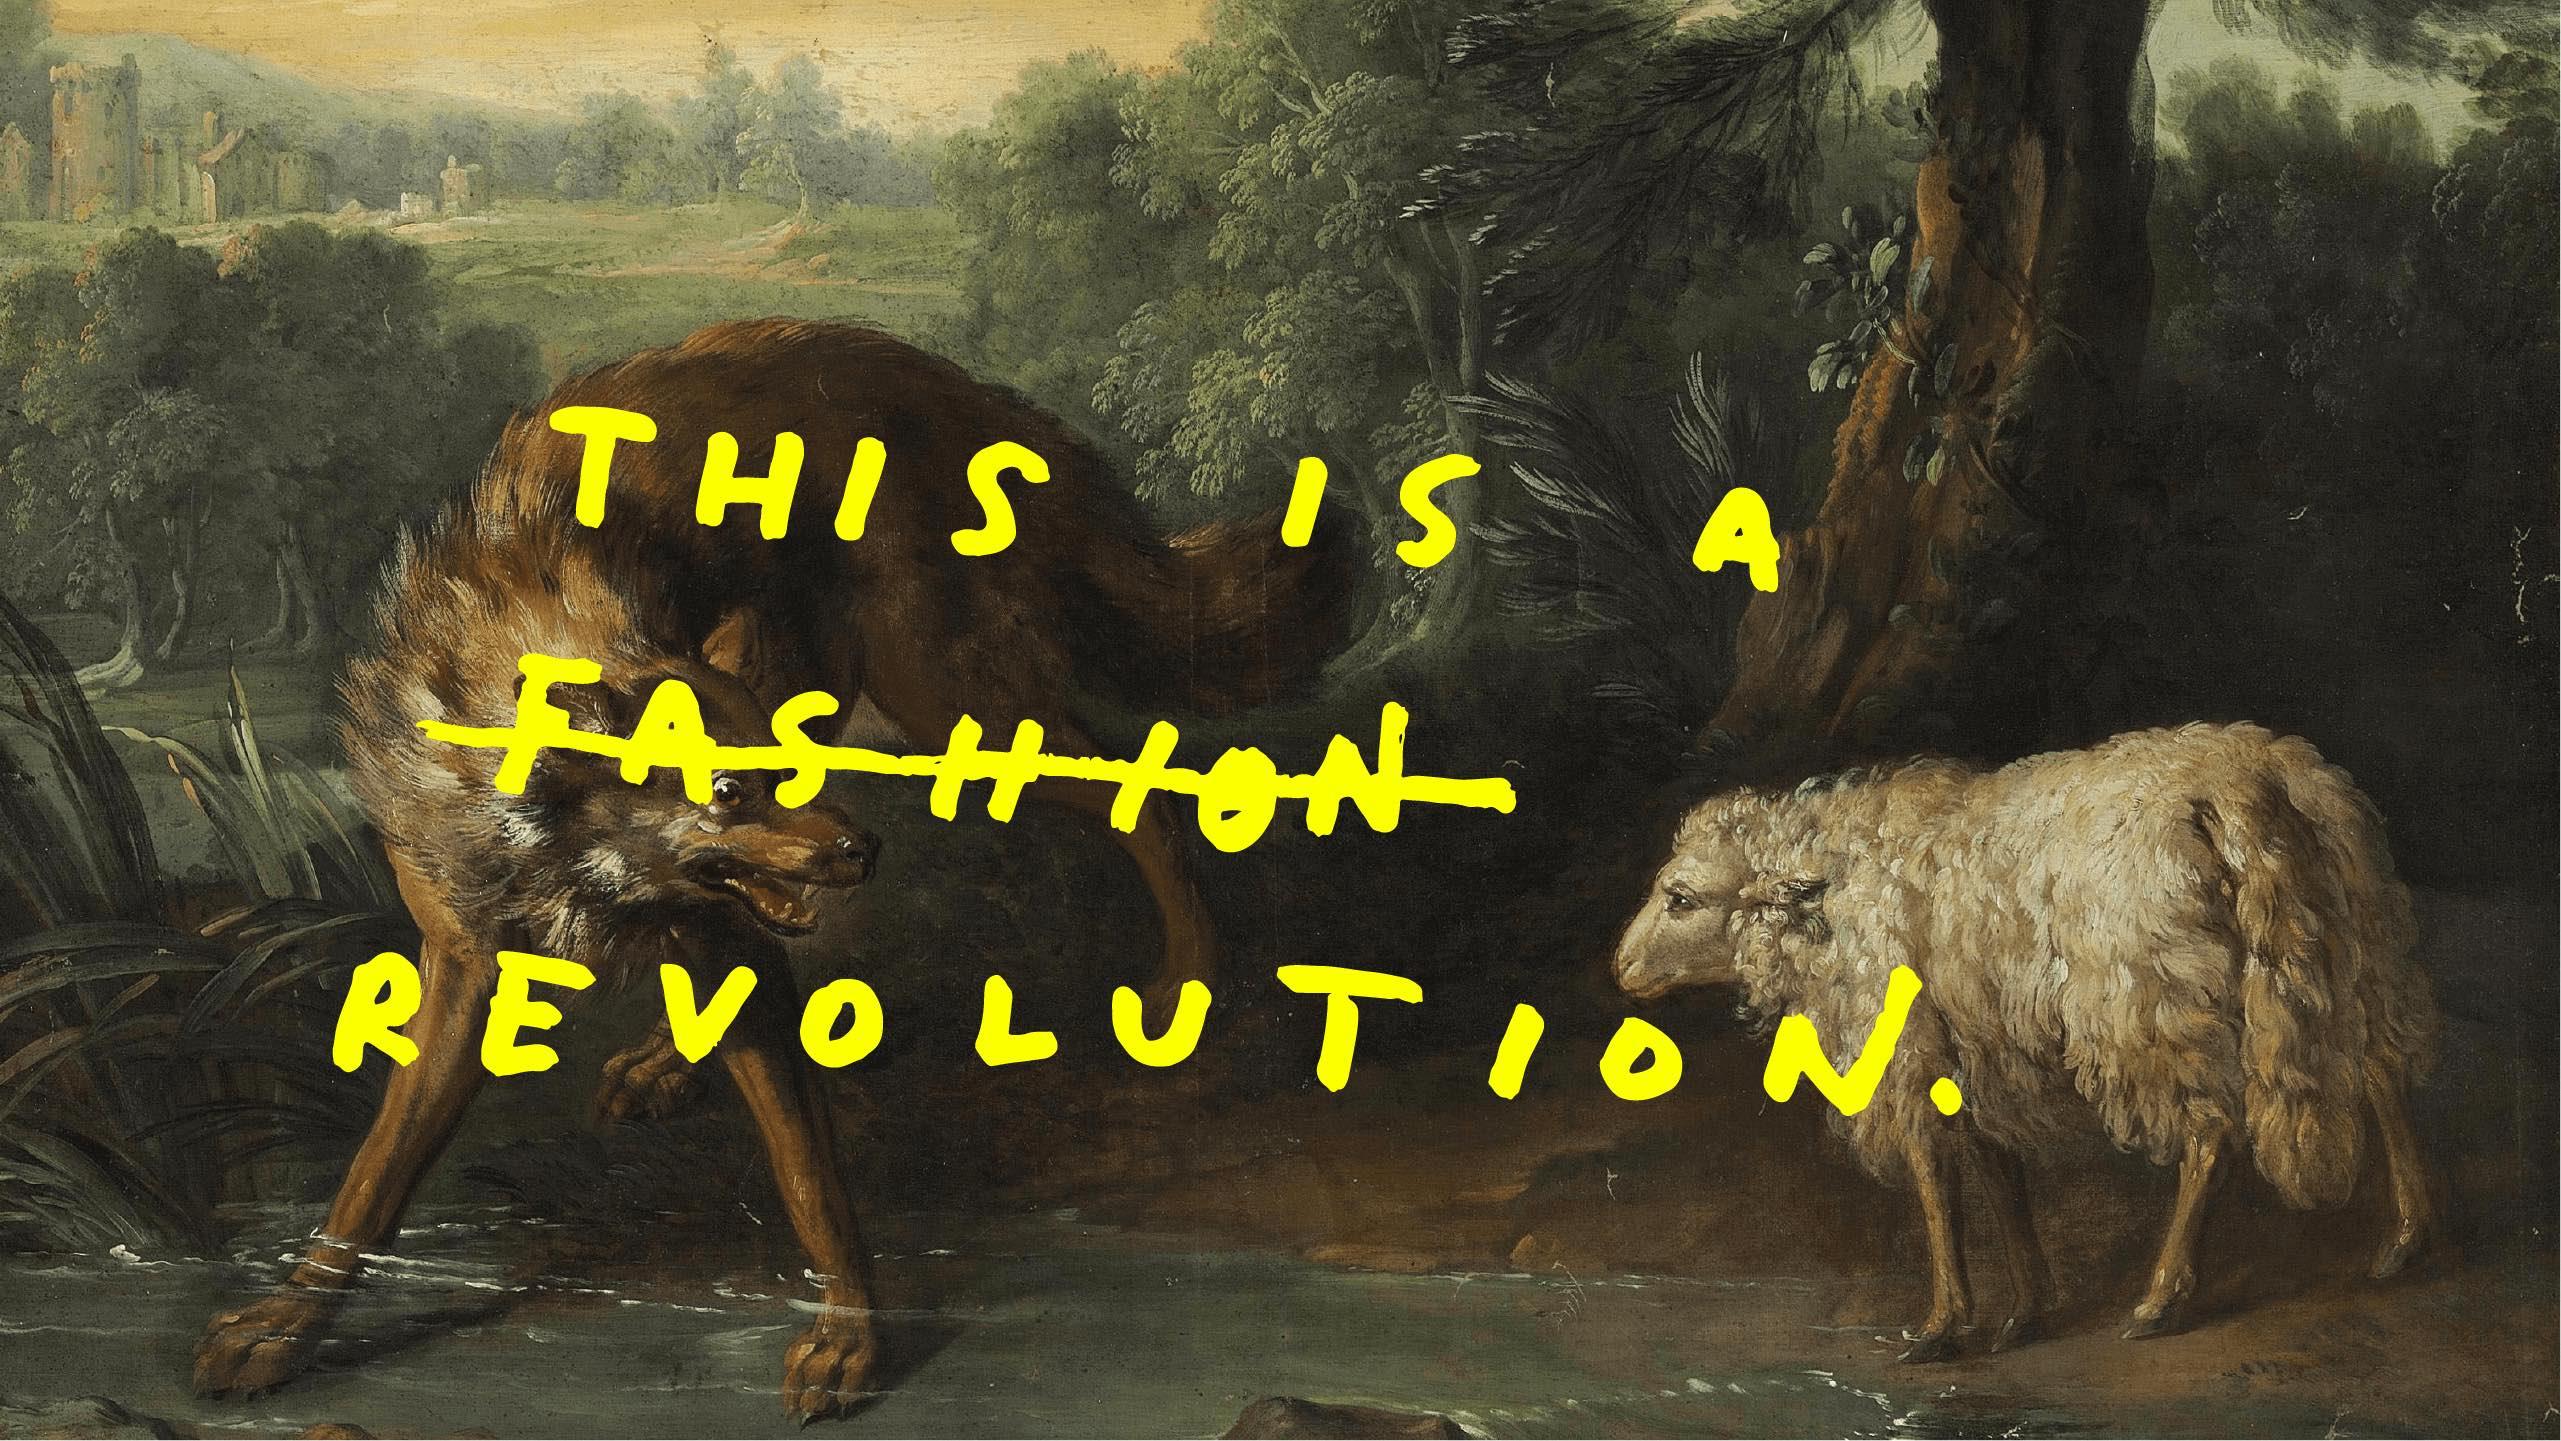 stupidstudio_case_brandstrategy_SHEEPINC-VISUAL-this-is-a-revolution